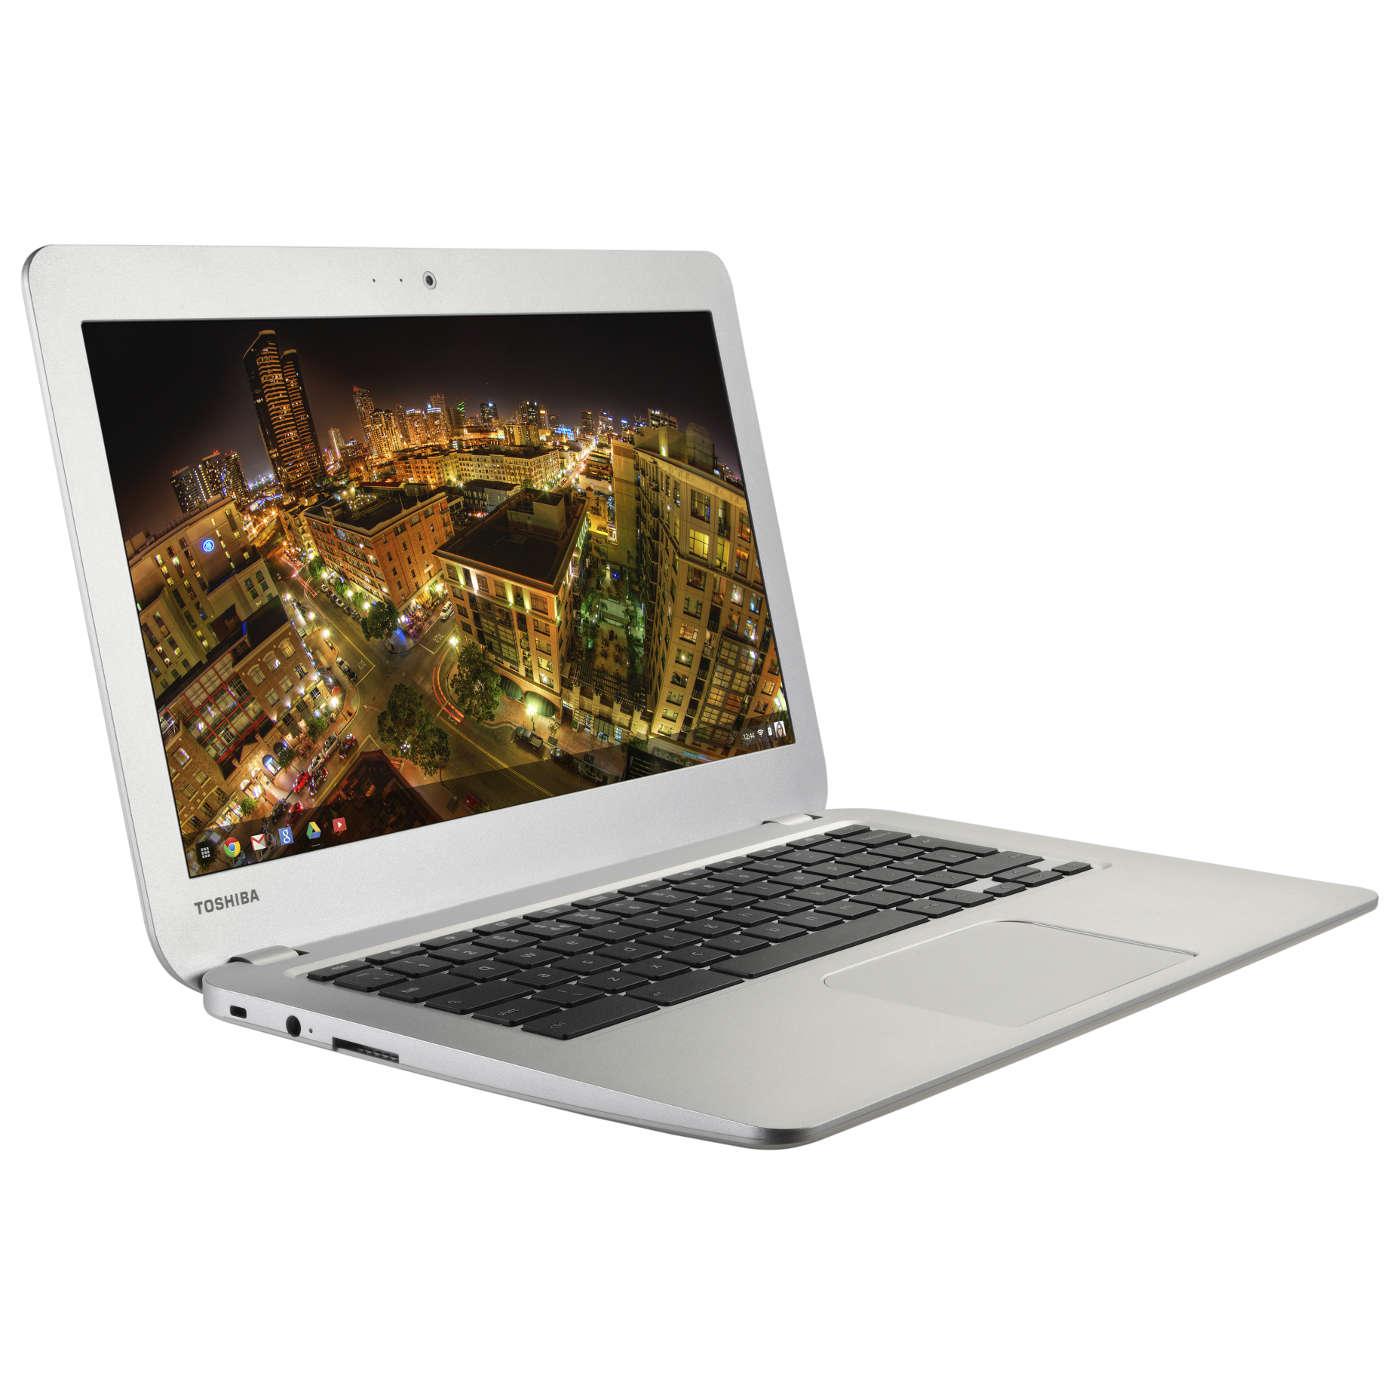 "PC portable Toshiba Chromebook CB30-B-104 Intel Celeron N2840 4 Go eMMC 16 Go 13.3"" LED Wi-Fi AC/Bluetooth Webcam Google Chrome OS"